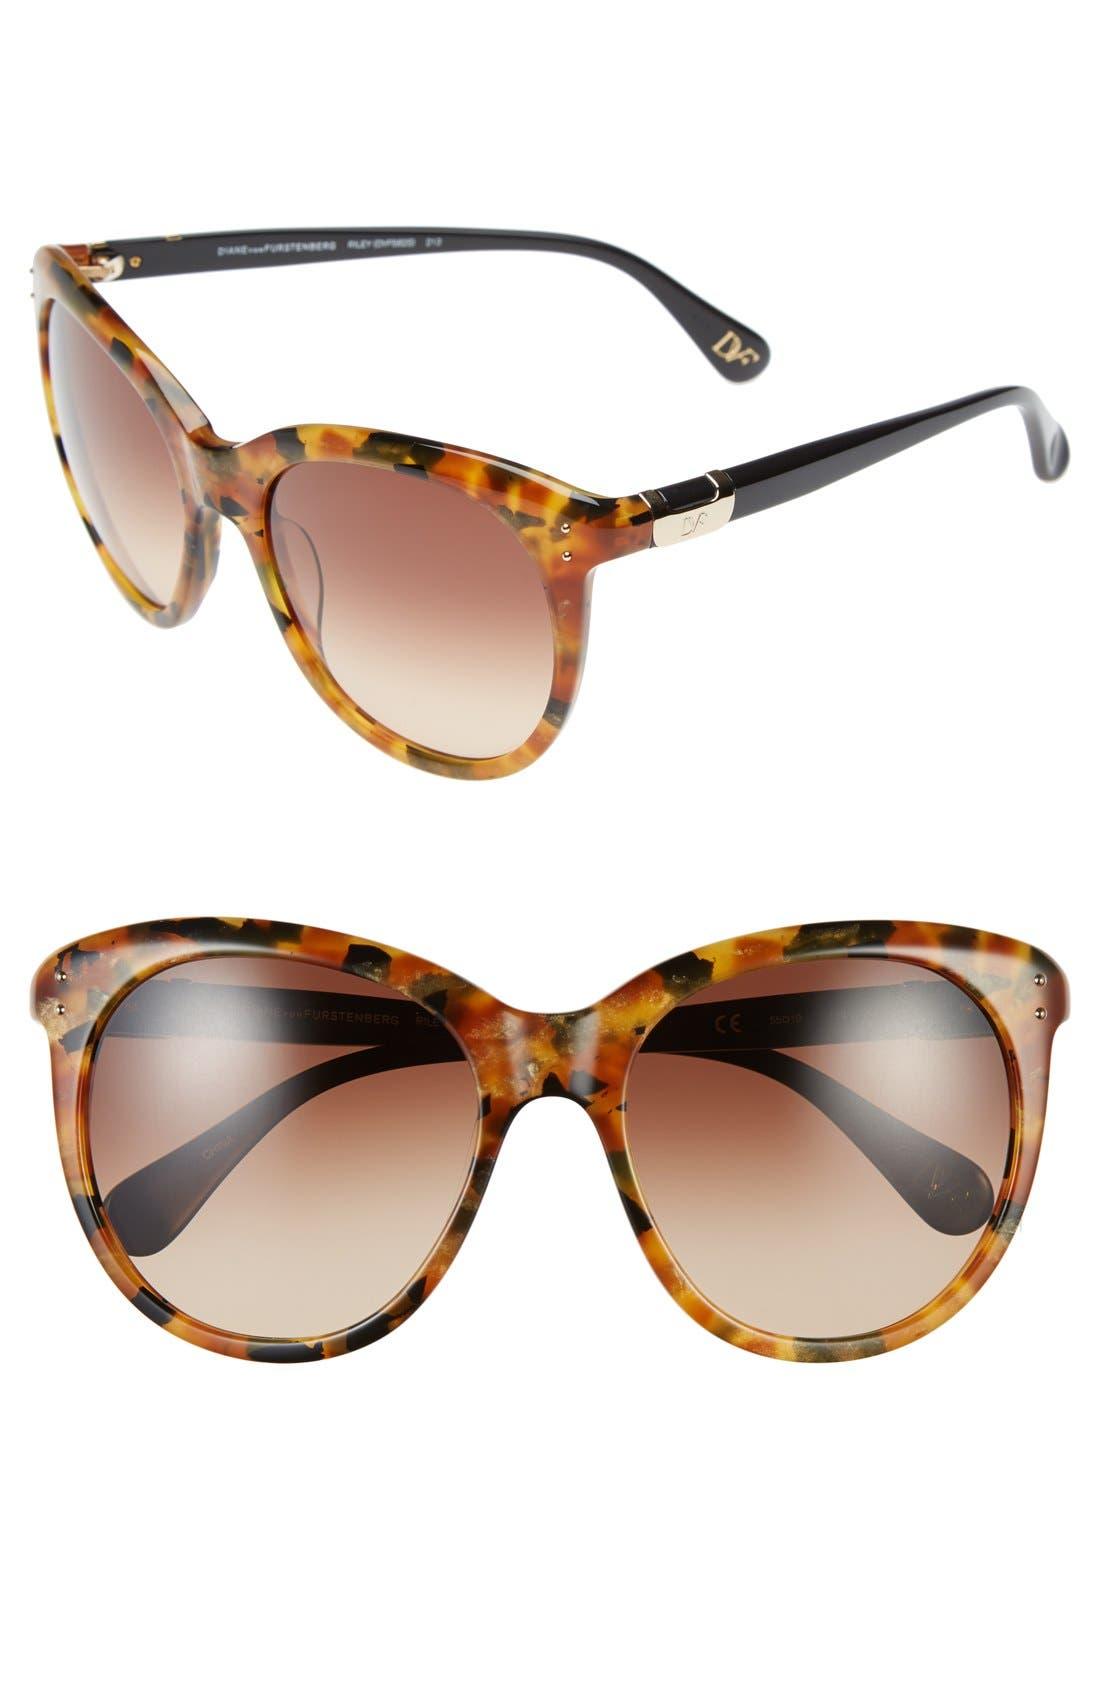 Main Image - Diane von Furstenberg 'Riley' 55mm Retro Sunglasses